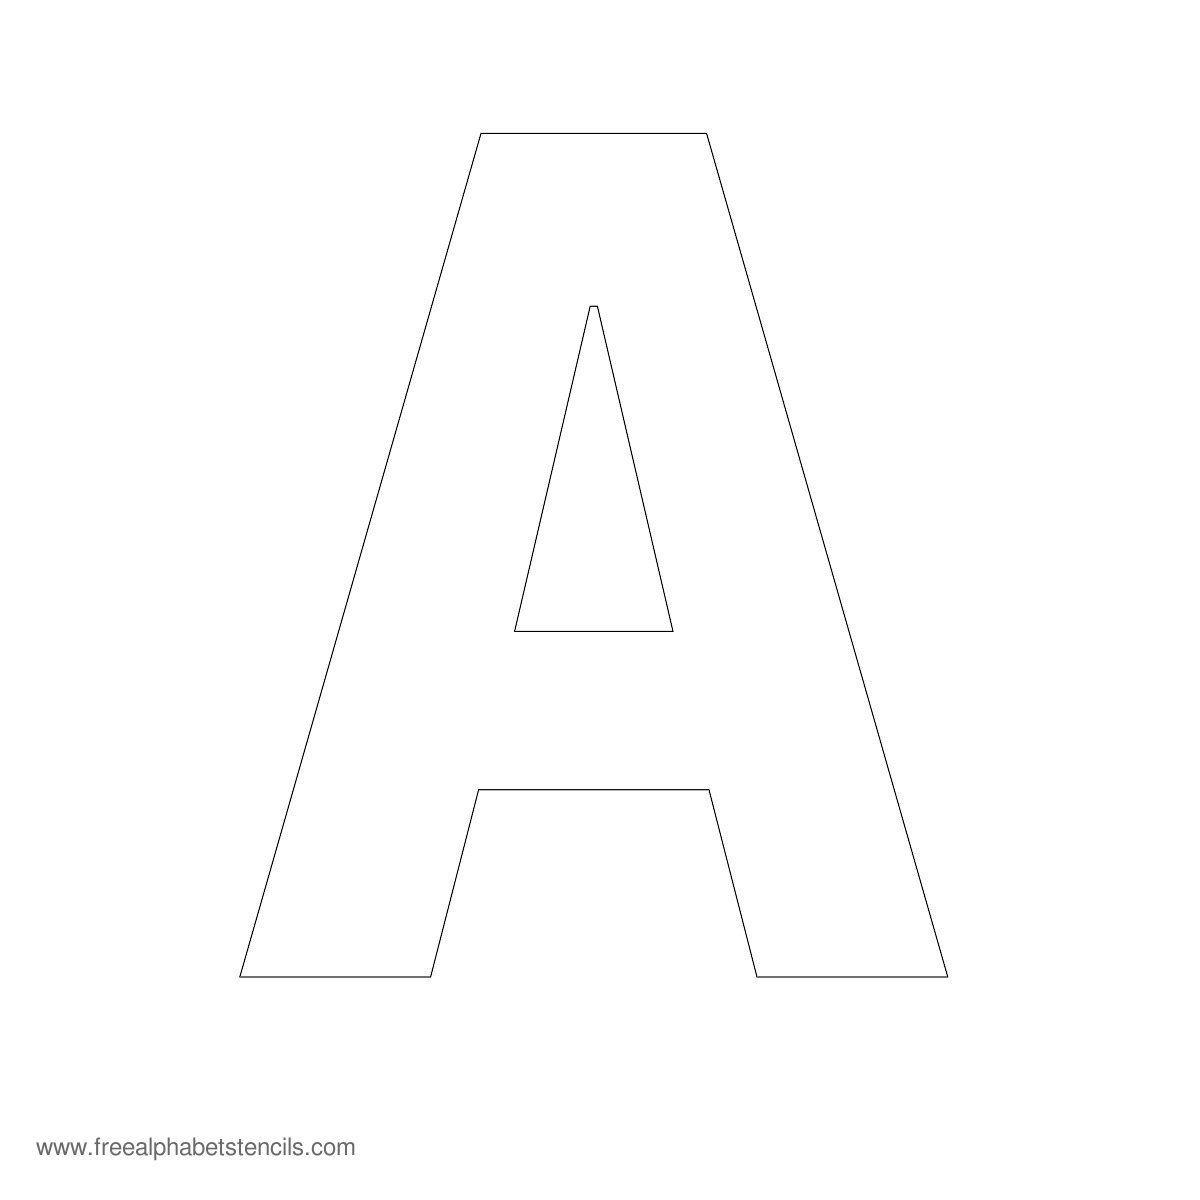 Free Printable Fancy Letters | Free Printable Large Alphabet Letter - Free Printable Large Letters